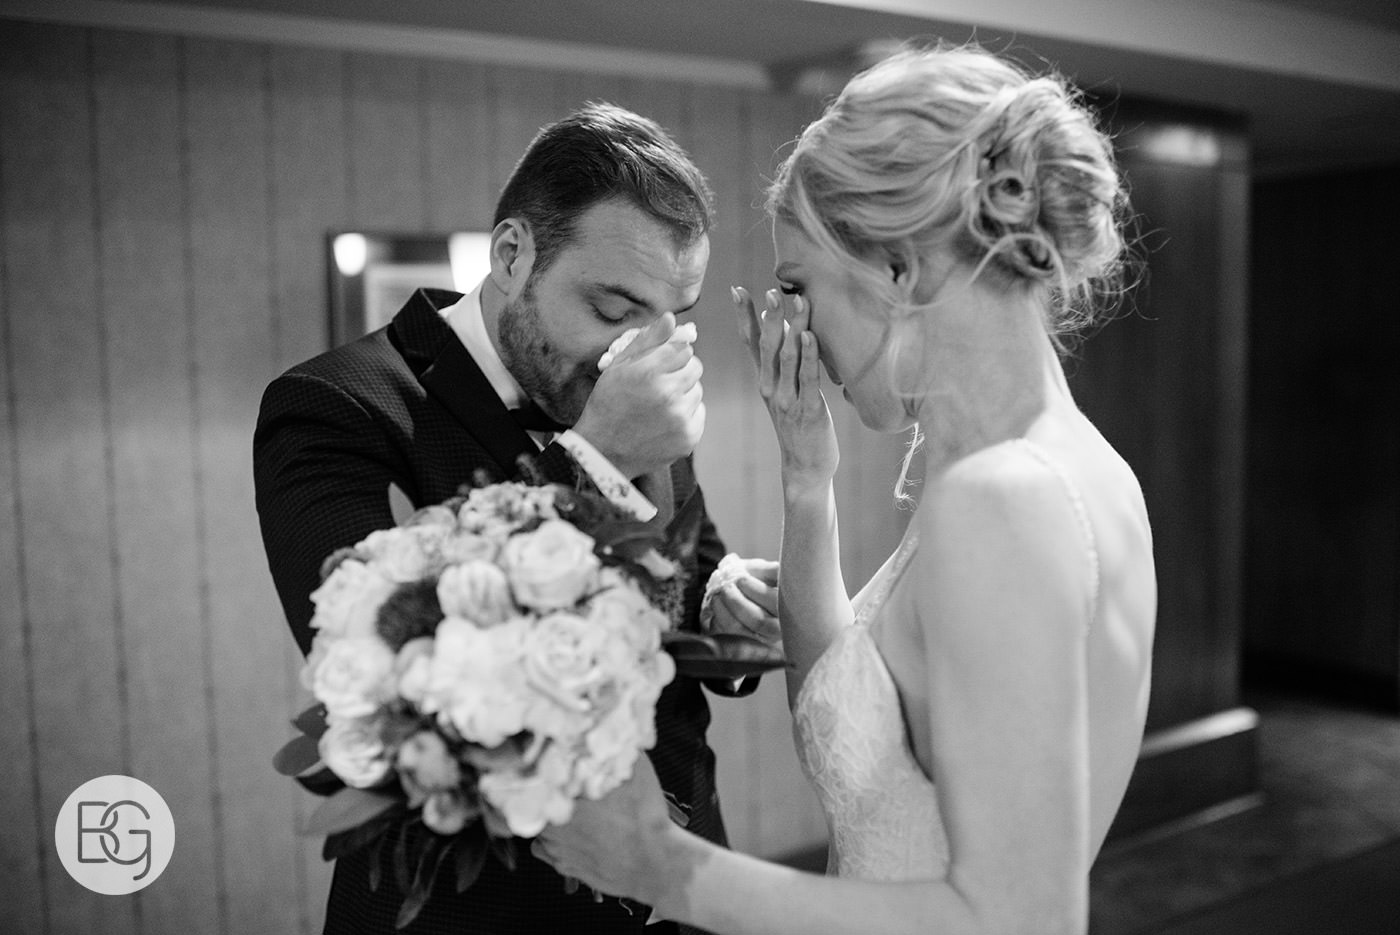 Edmonton_wedding_photographers_josh_sara_whyte_33.jpg